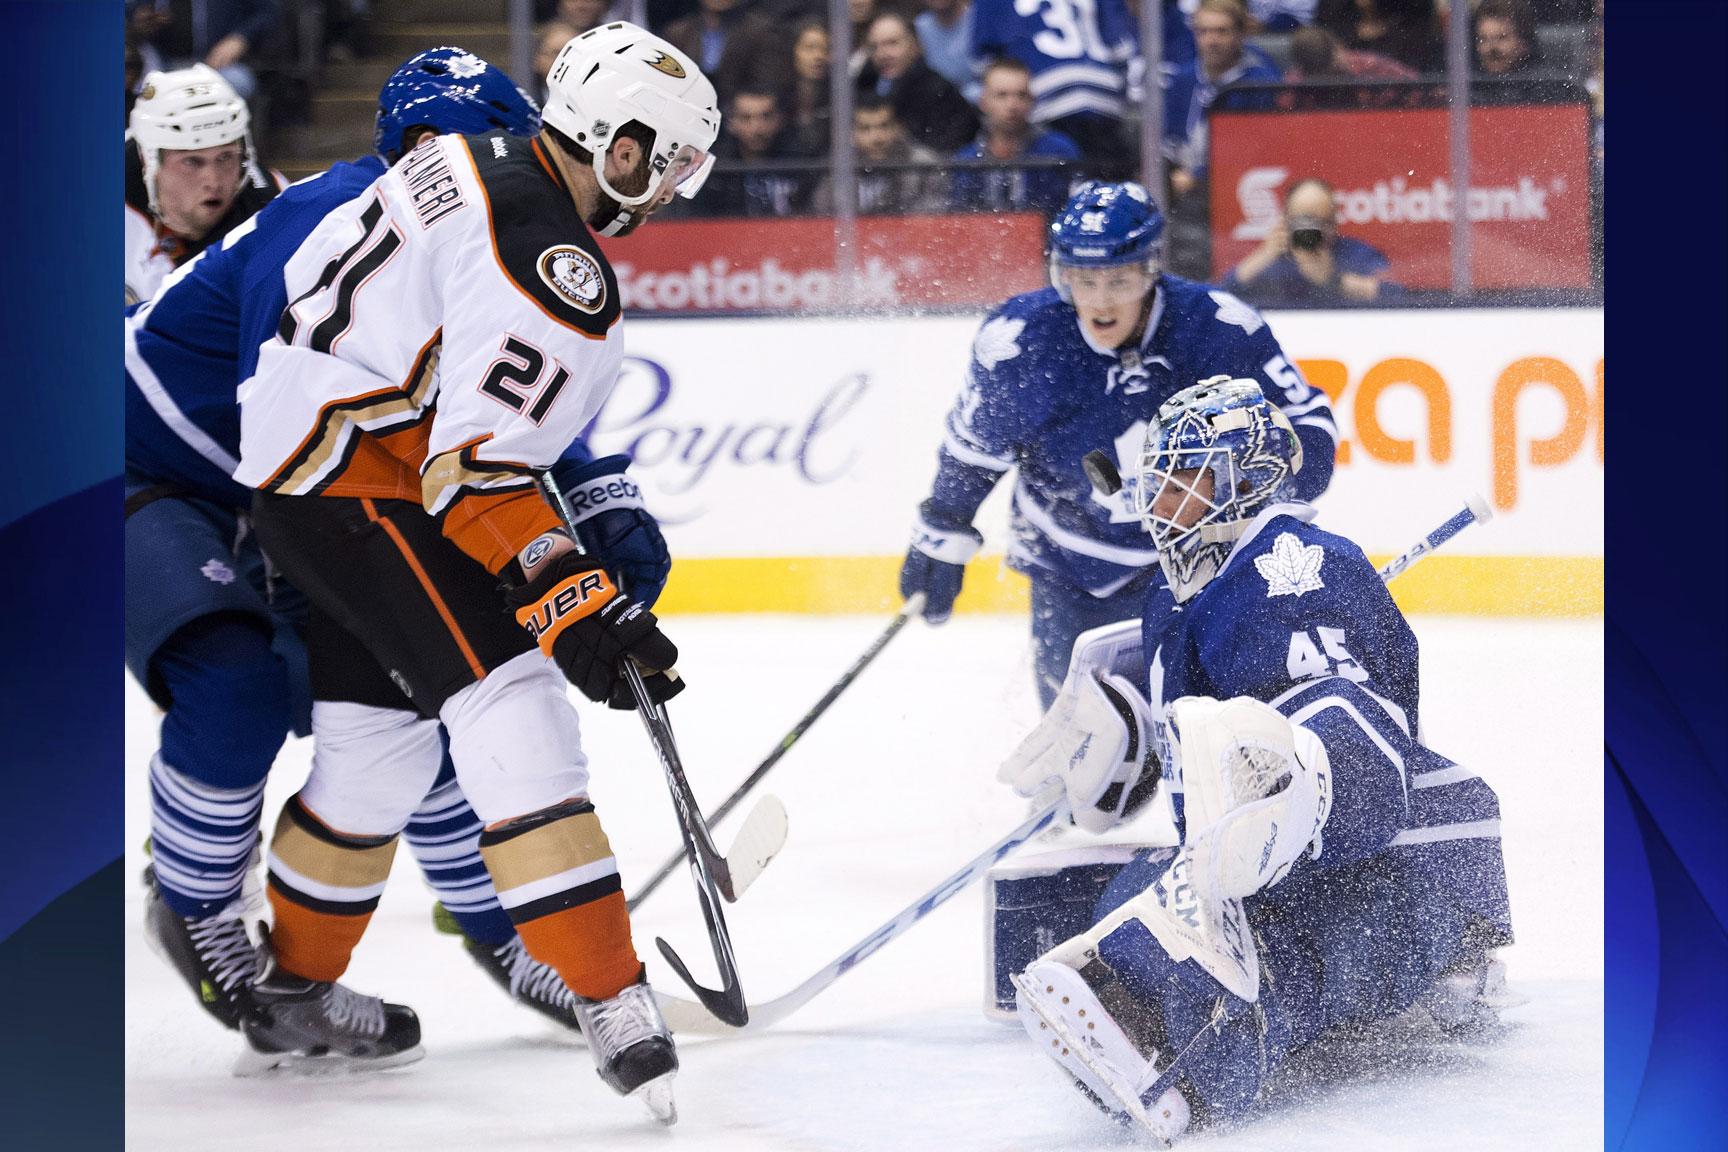 Leafs keep rolling, win sixth straight over Ducks